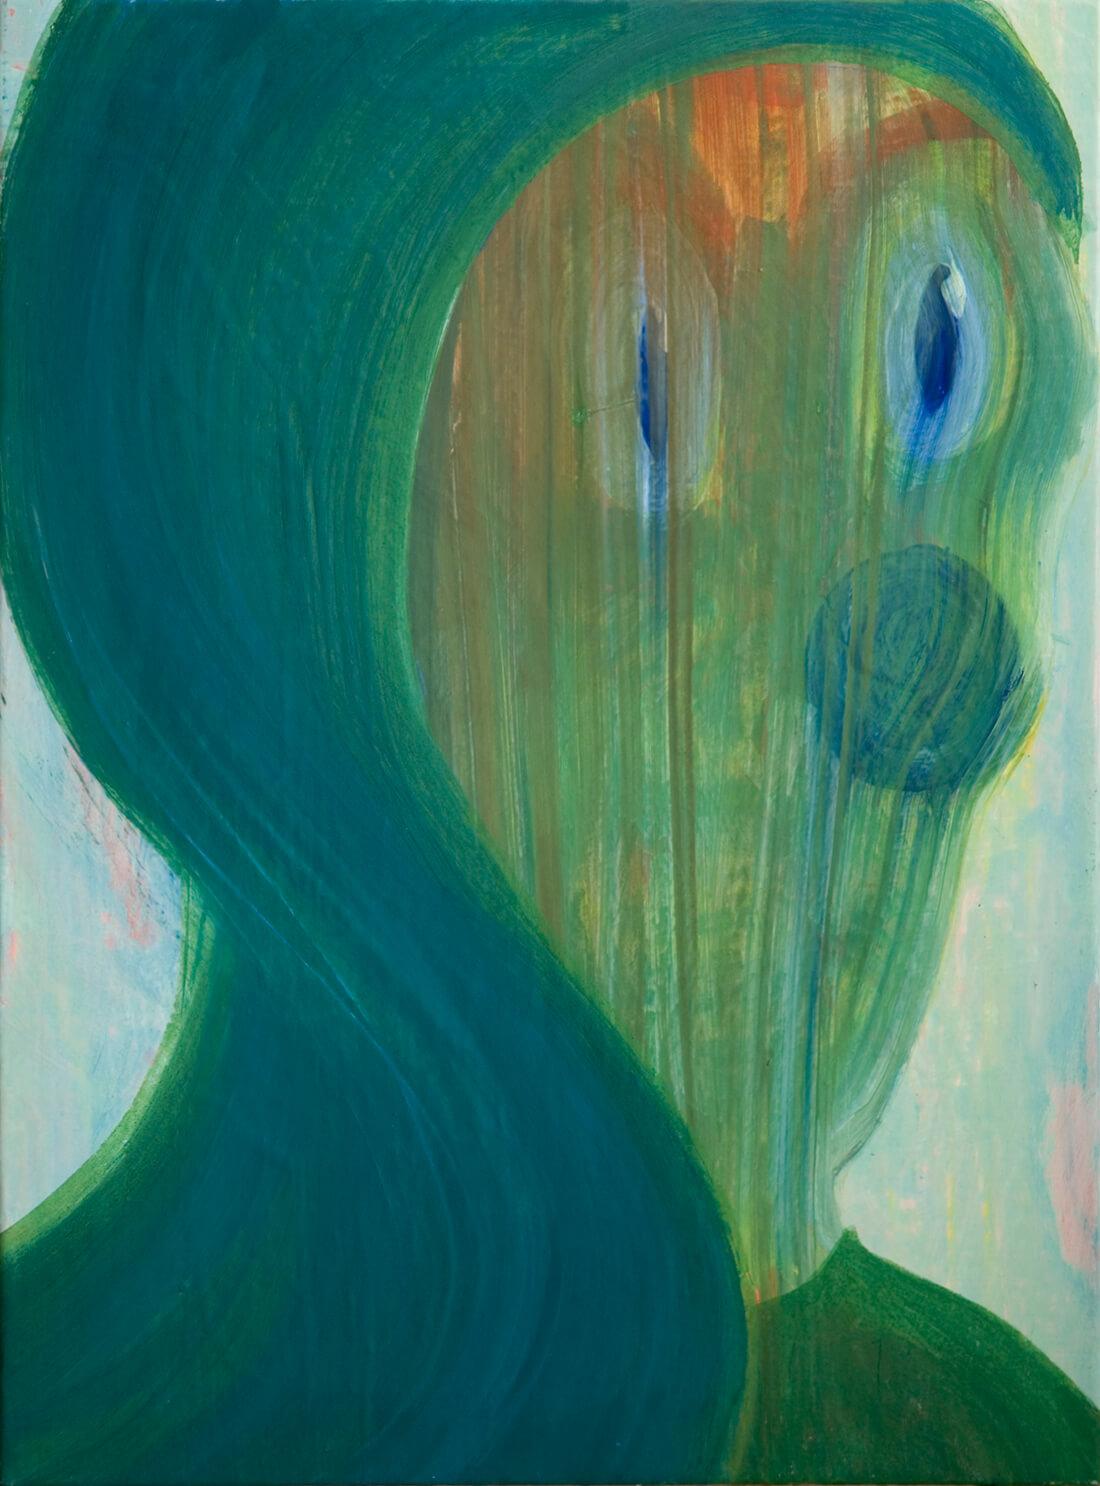 untitled (veil head), 73 x 54 cm, egg tempera on canvas, 2009